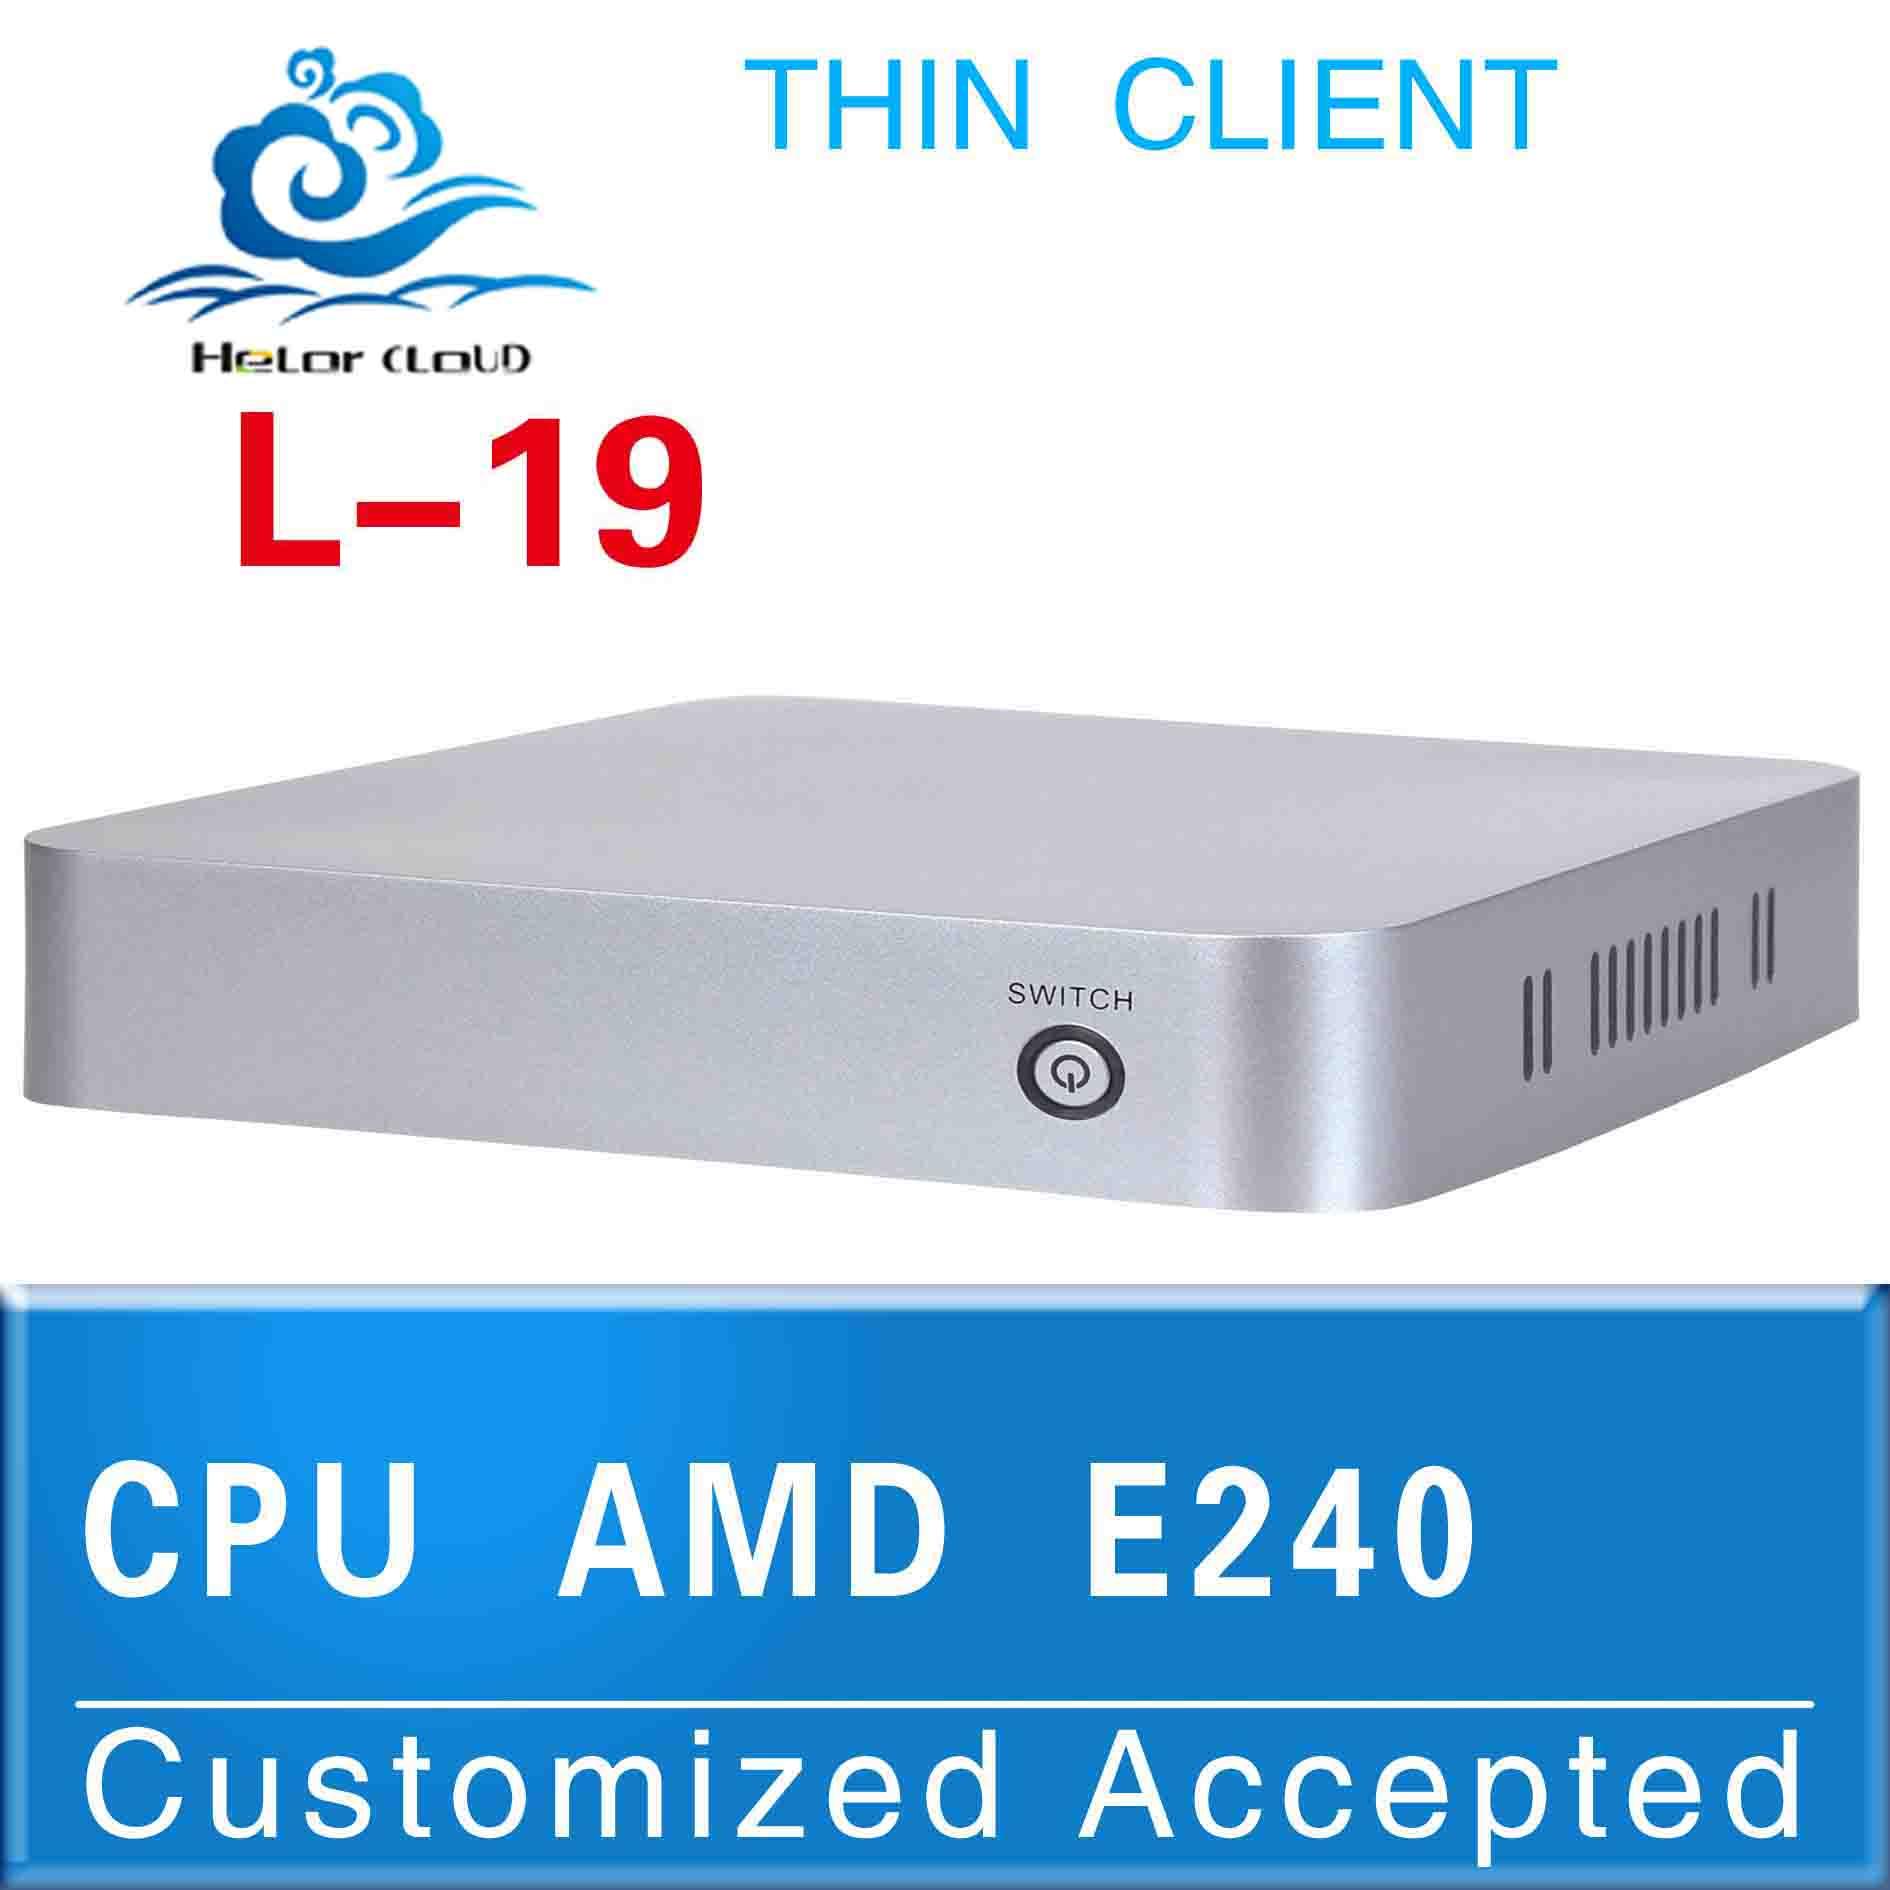 the cheapest powerful mini computer l-19 mini business pc AMD E240 1.5ghz fan desktop ATI HD6310 graphics 512M thin client(China (Mainland))